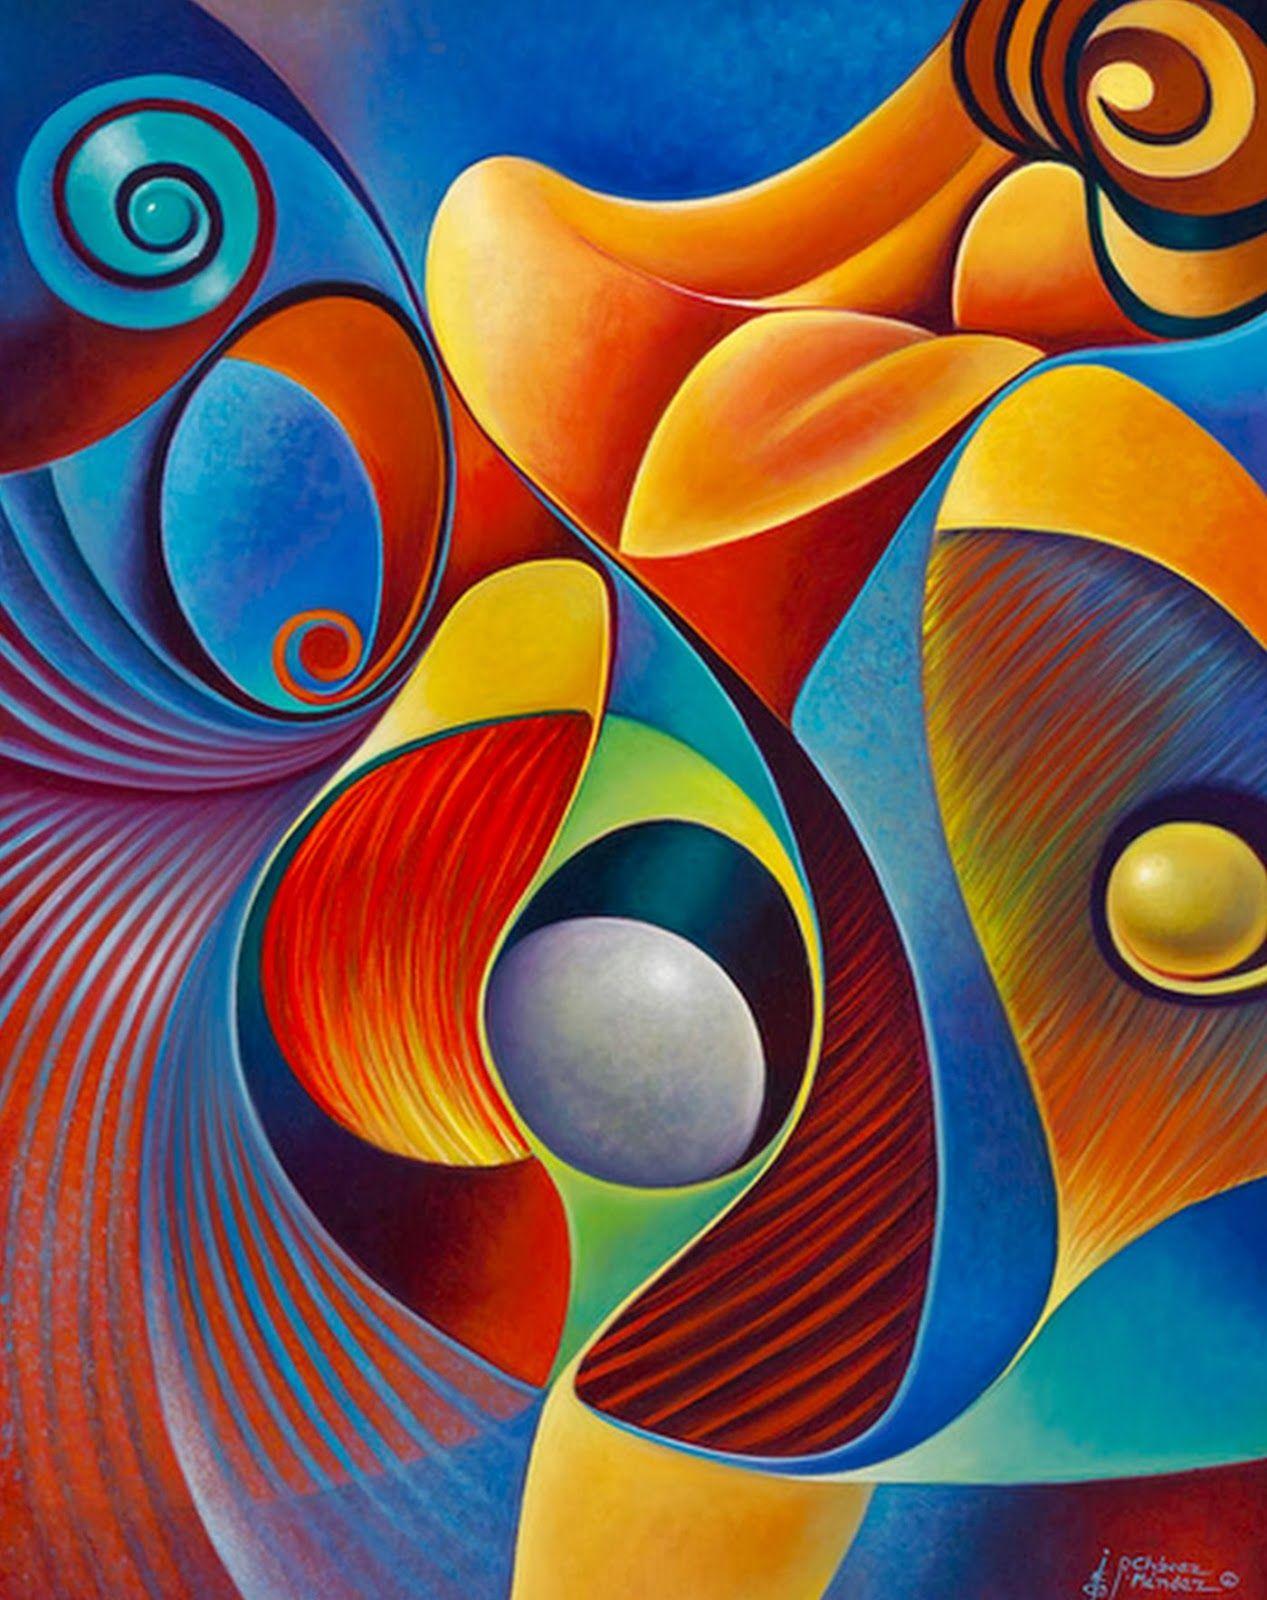 Pinturas abstractas modernas para comedor ideas para el for Imagenes de cuadros abstractos modernos para sala